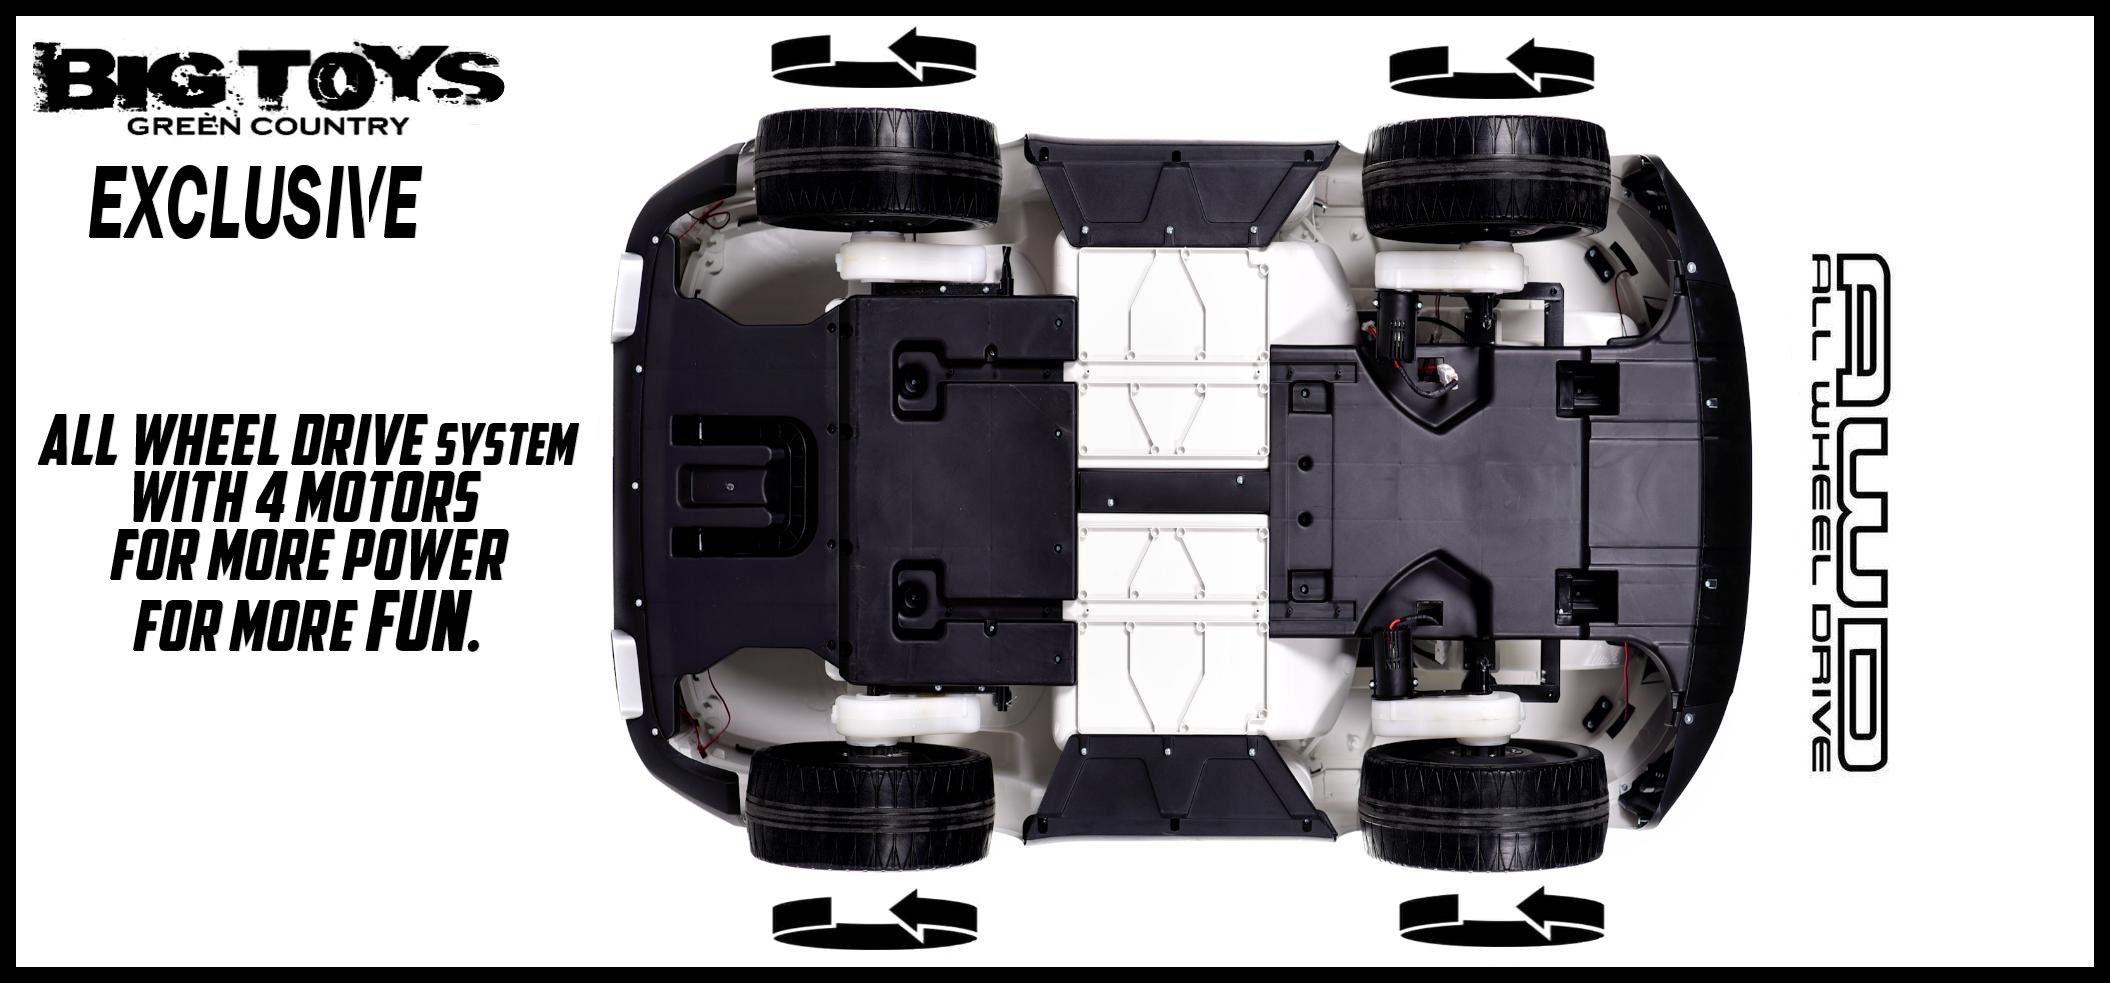 4x4-underside-lr-rr.png